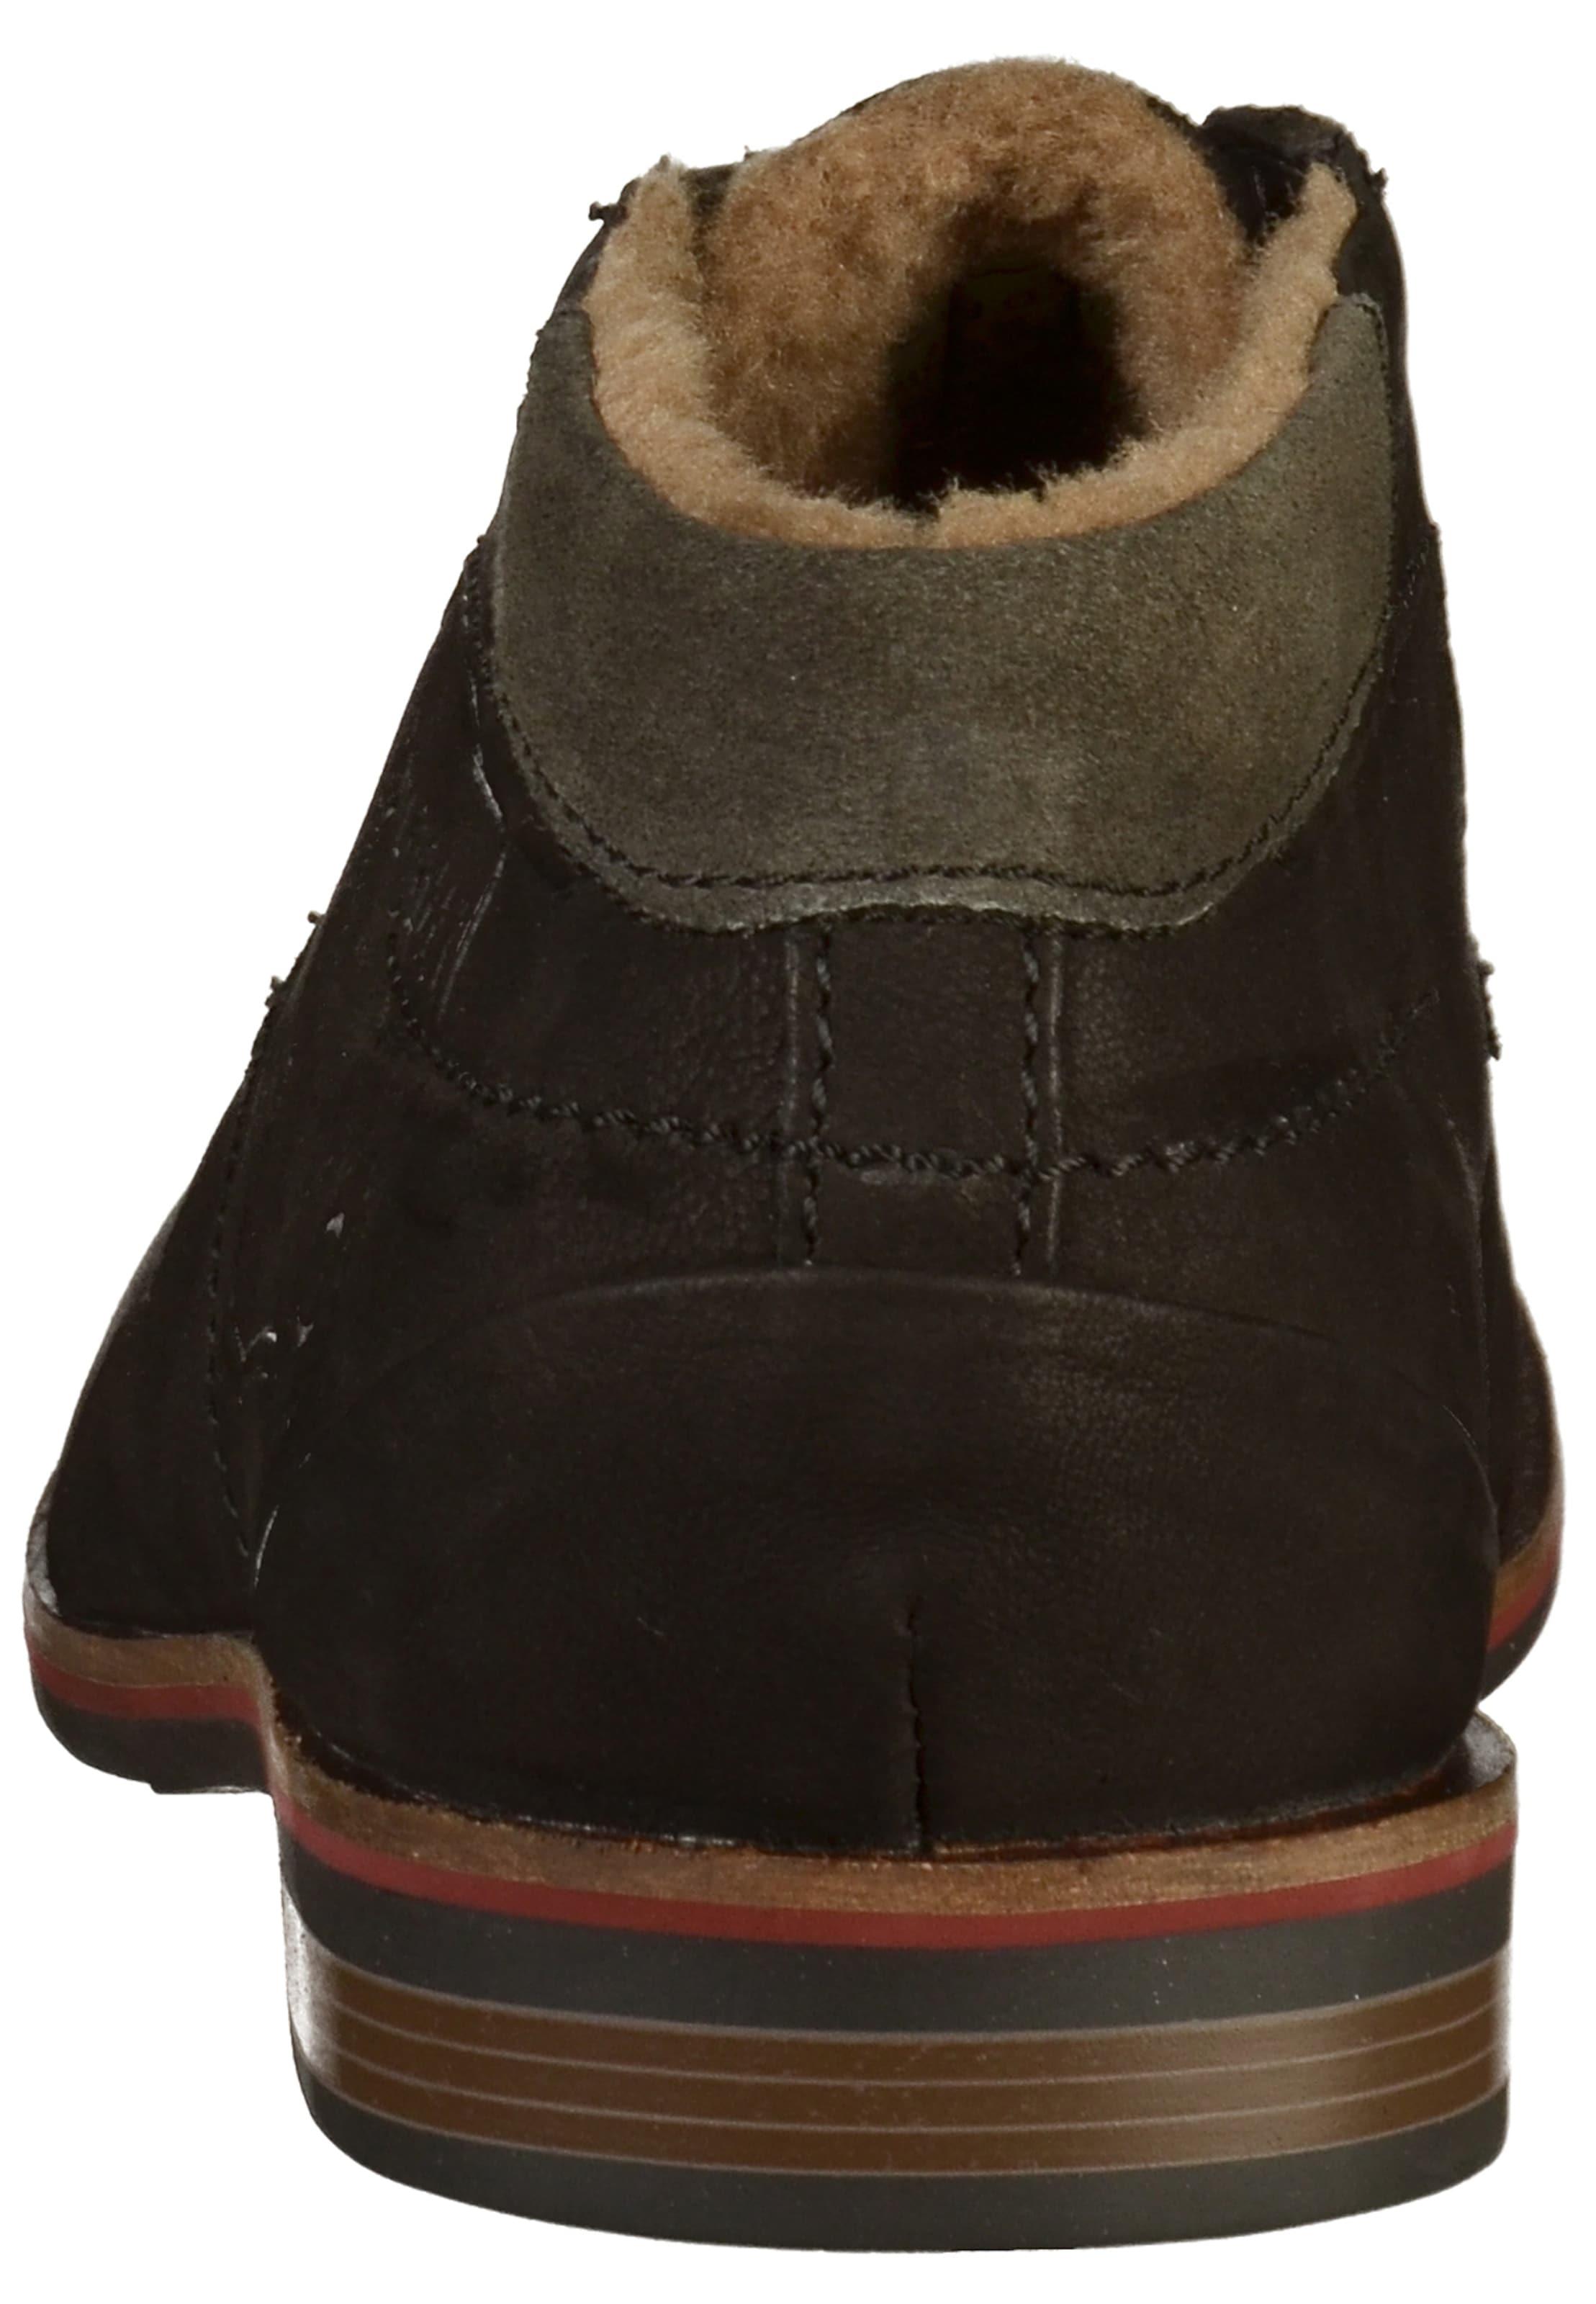 En Boots Bugatti En Boots En Bugatti Bugatti Chukka Chukka Boots Chukka Marron Marron sdQCrht